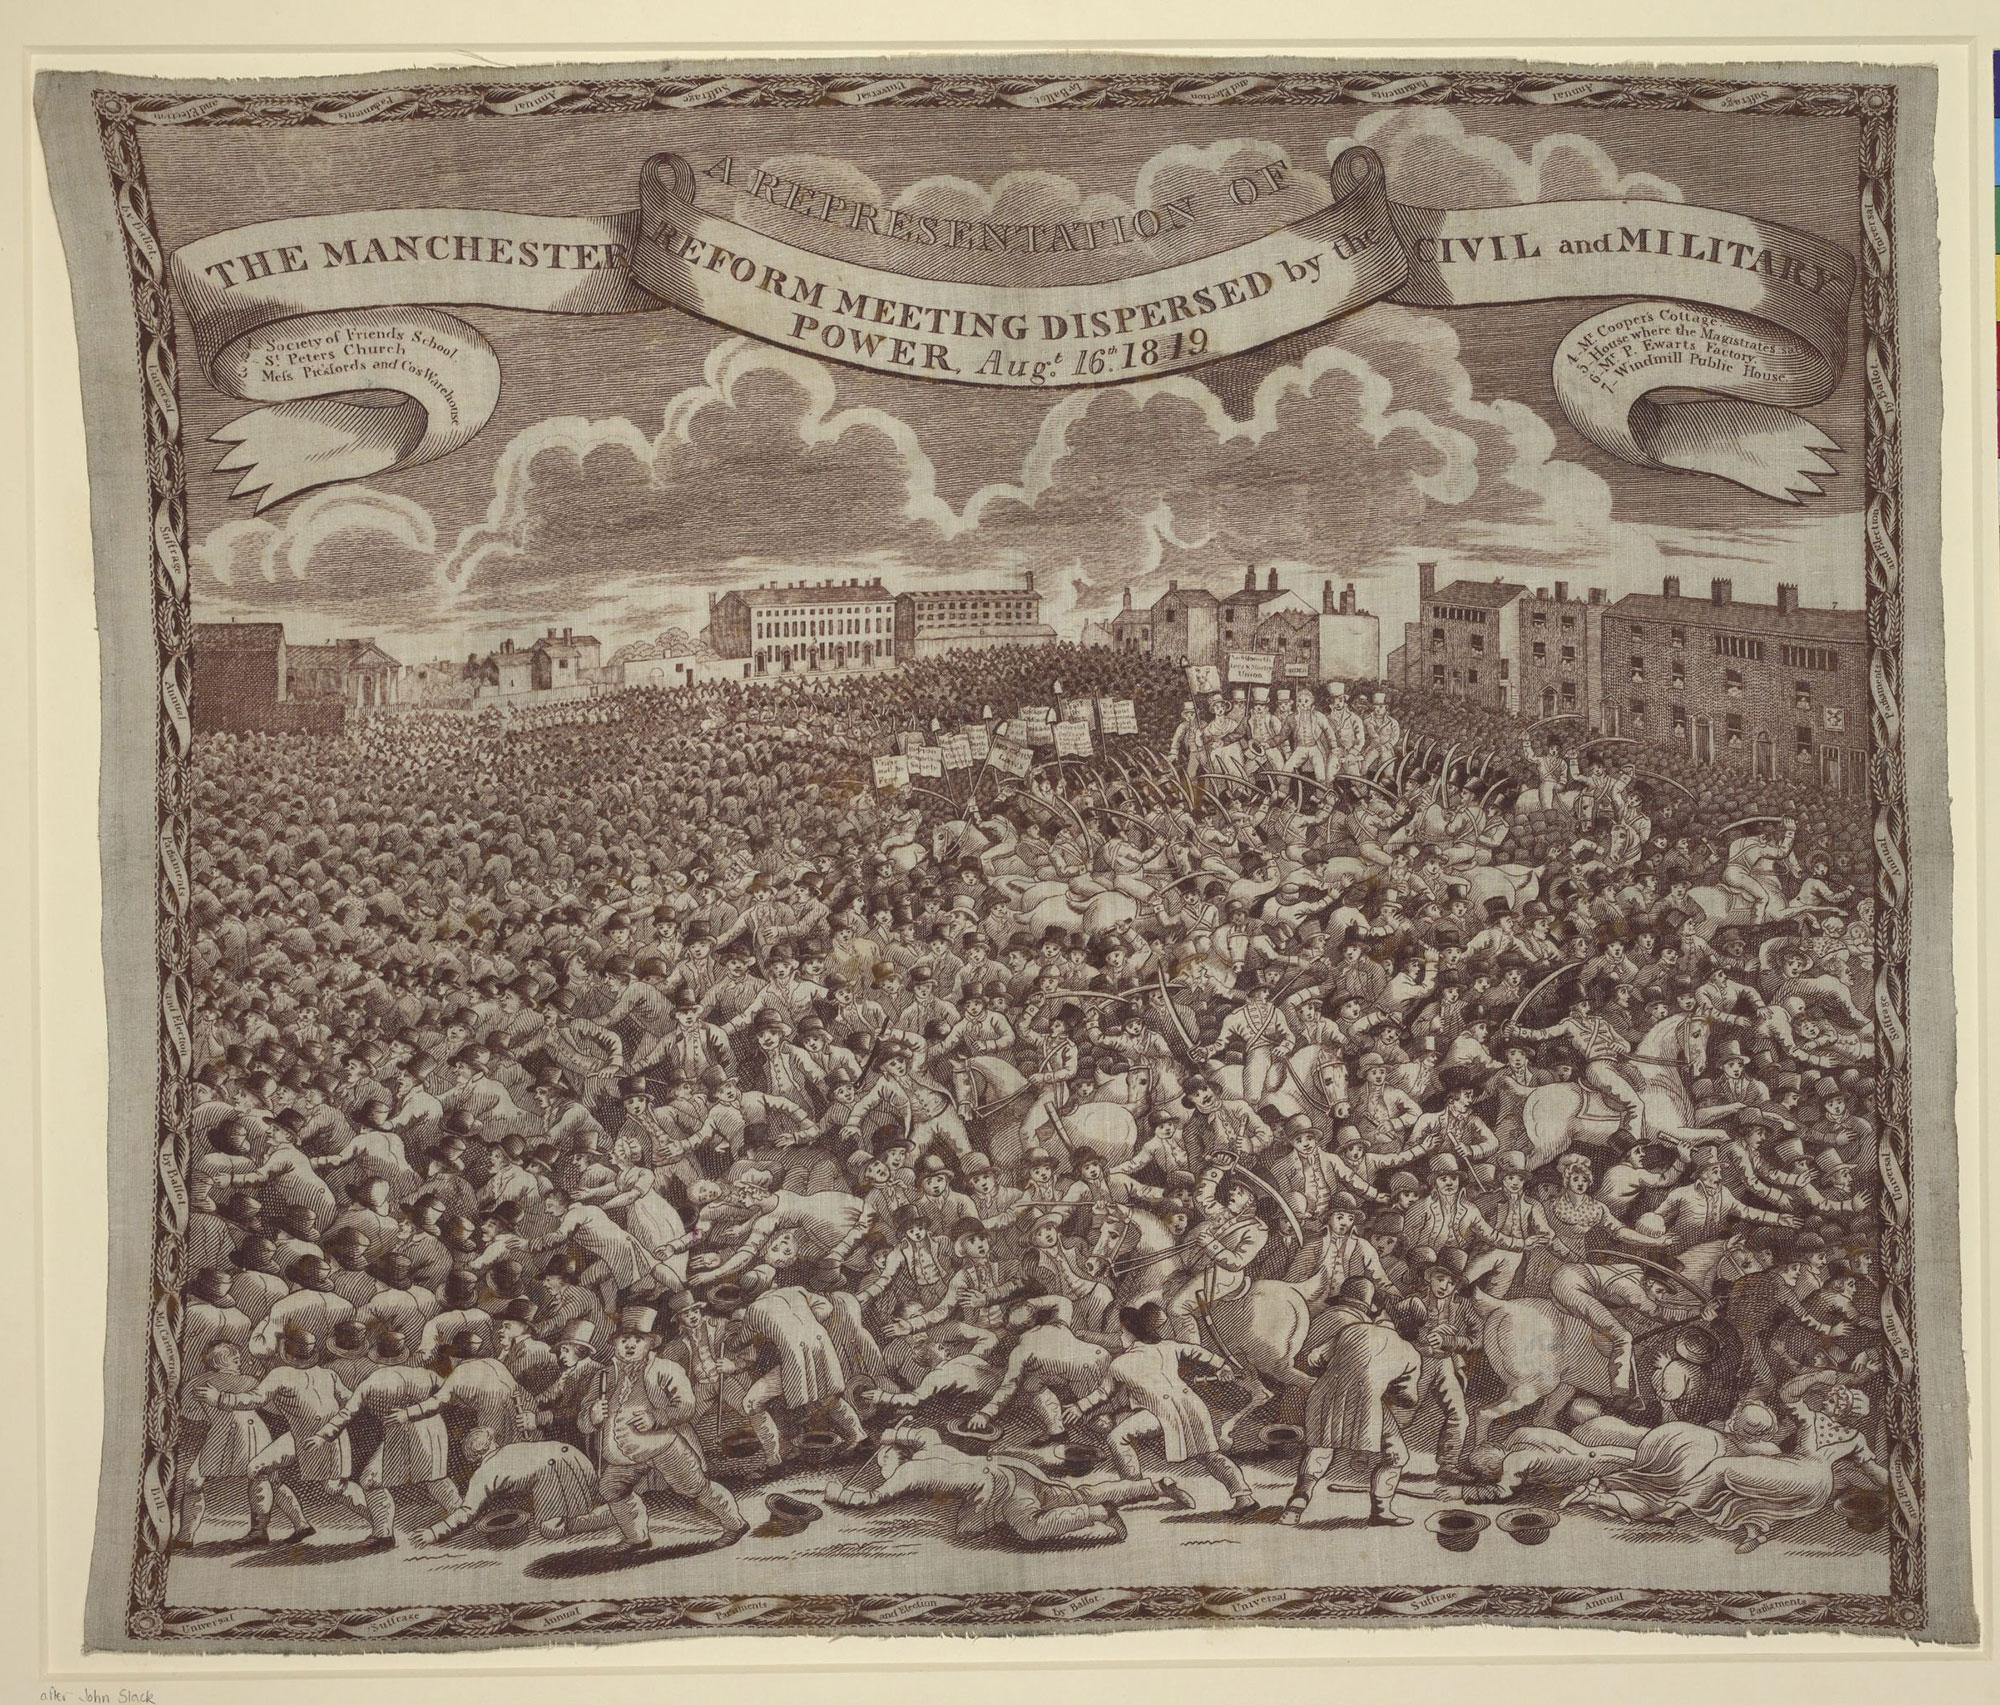 Handkerchief representing the Peterloo Massacre